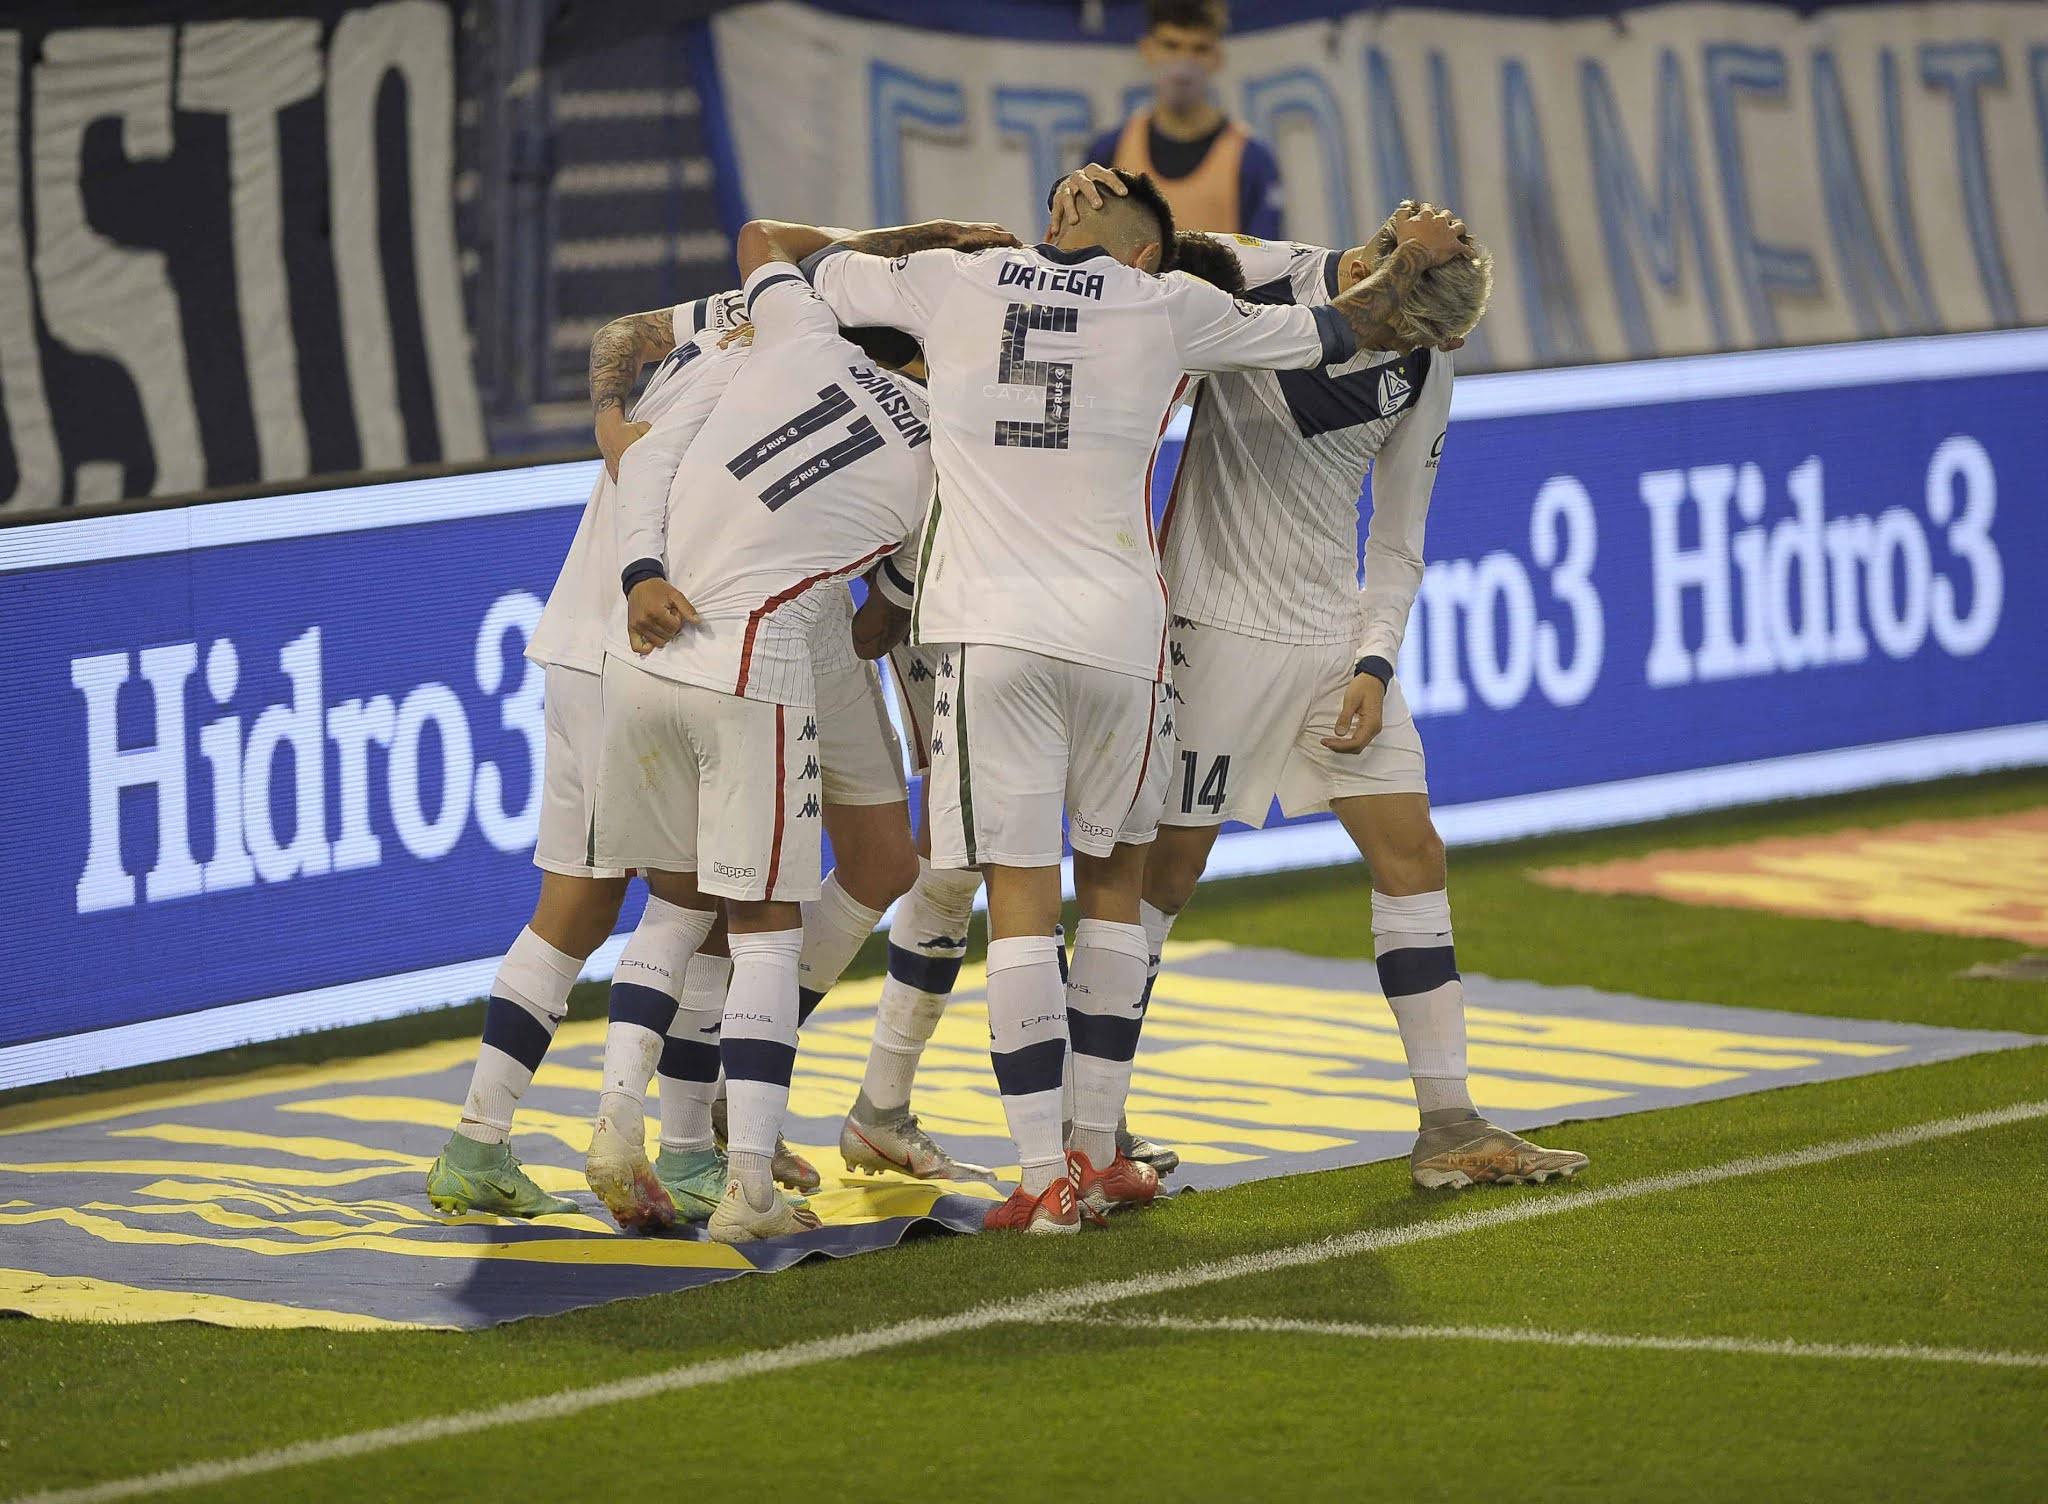 Vélez se lució al golear a Godoy Cruz en Liniers